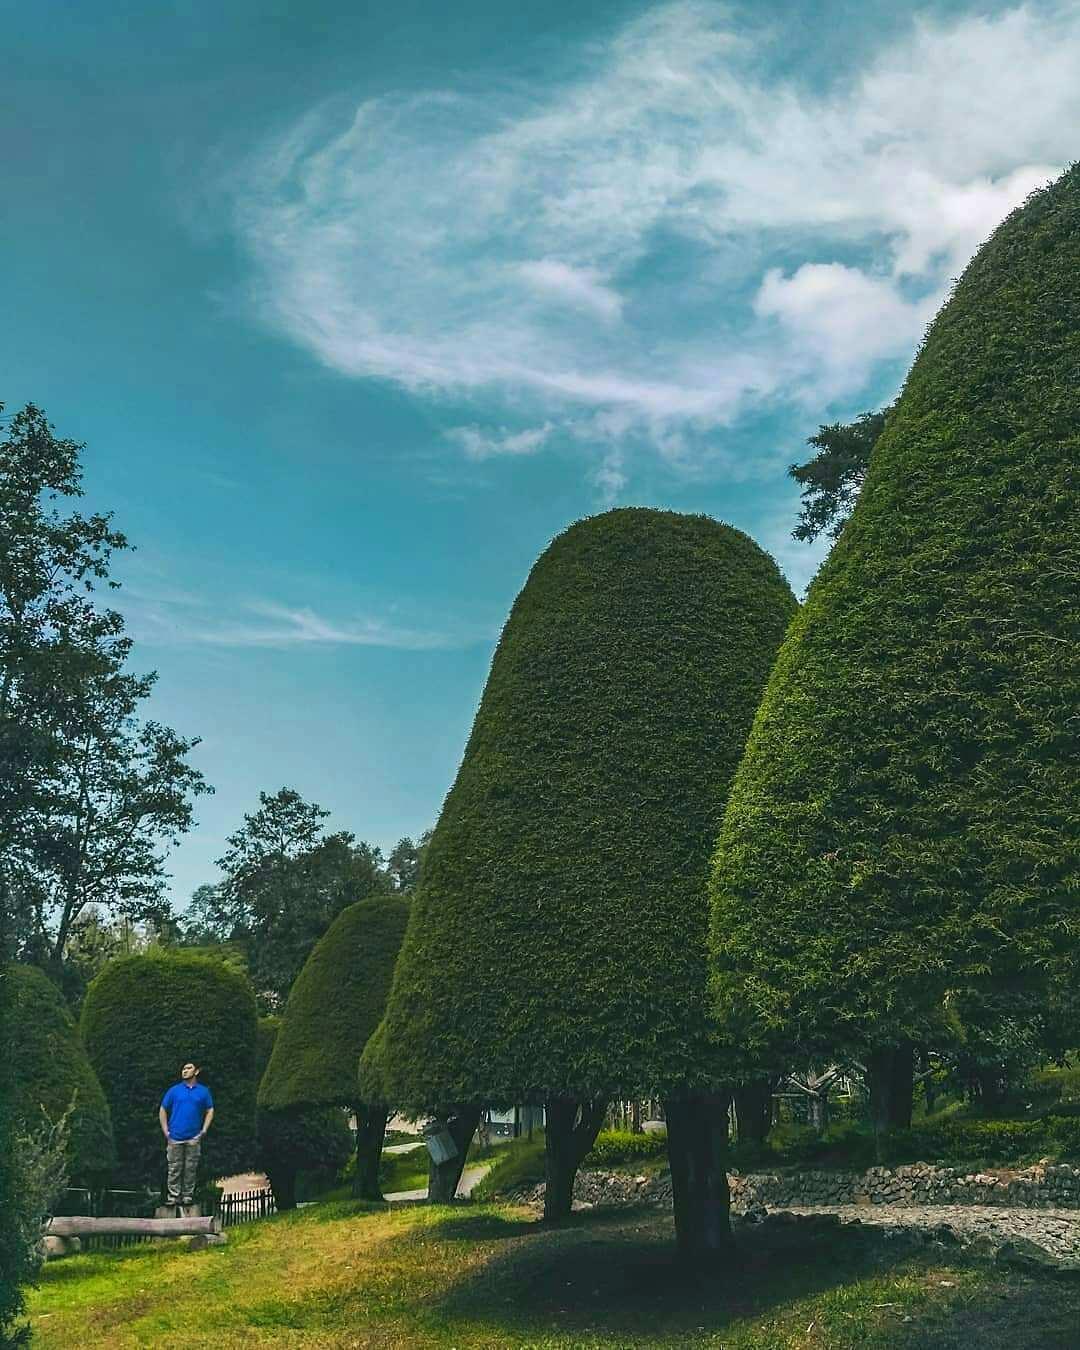 Pohon Berbentuk Jamur Payung di Bukit Jamur Rancabolang Ciwidey Bandung, Image From @why_ajie